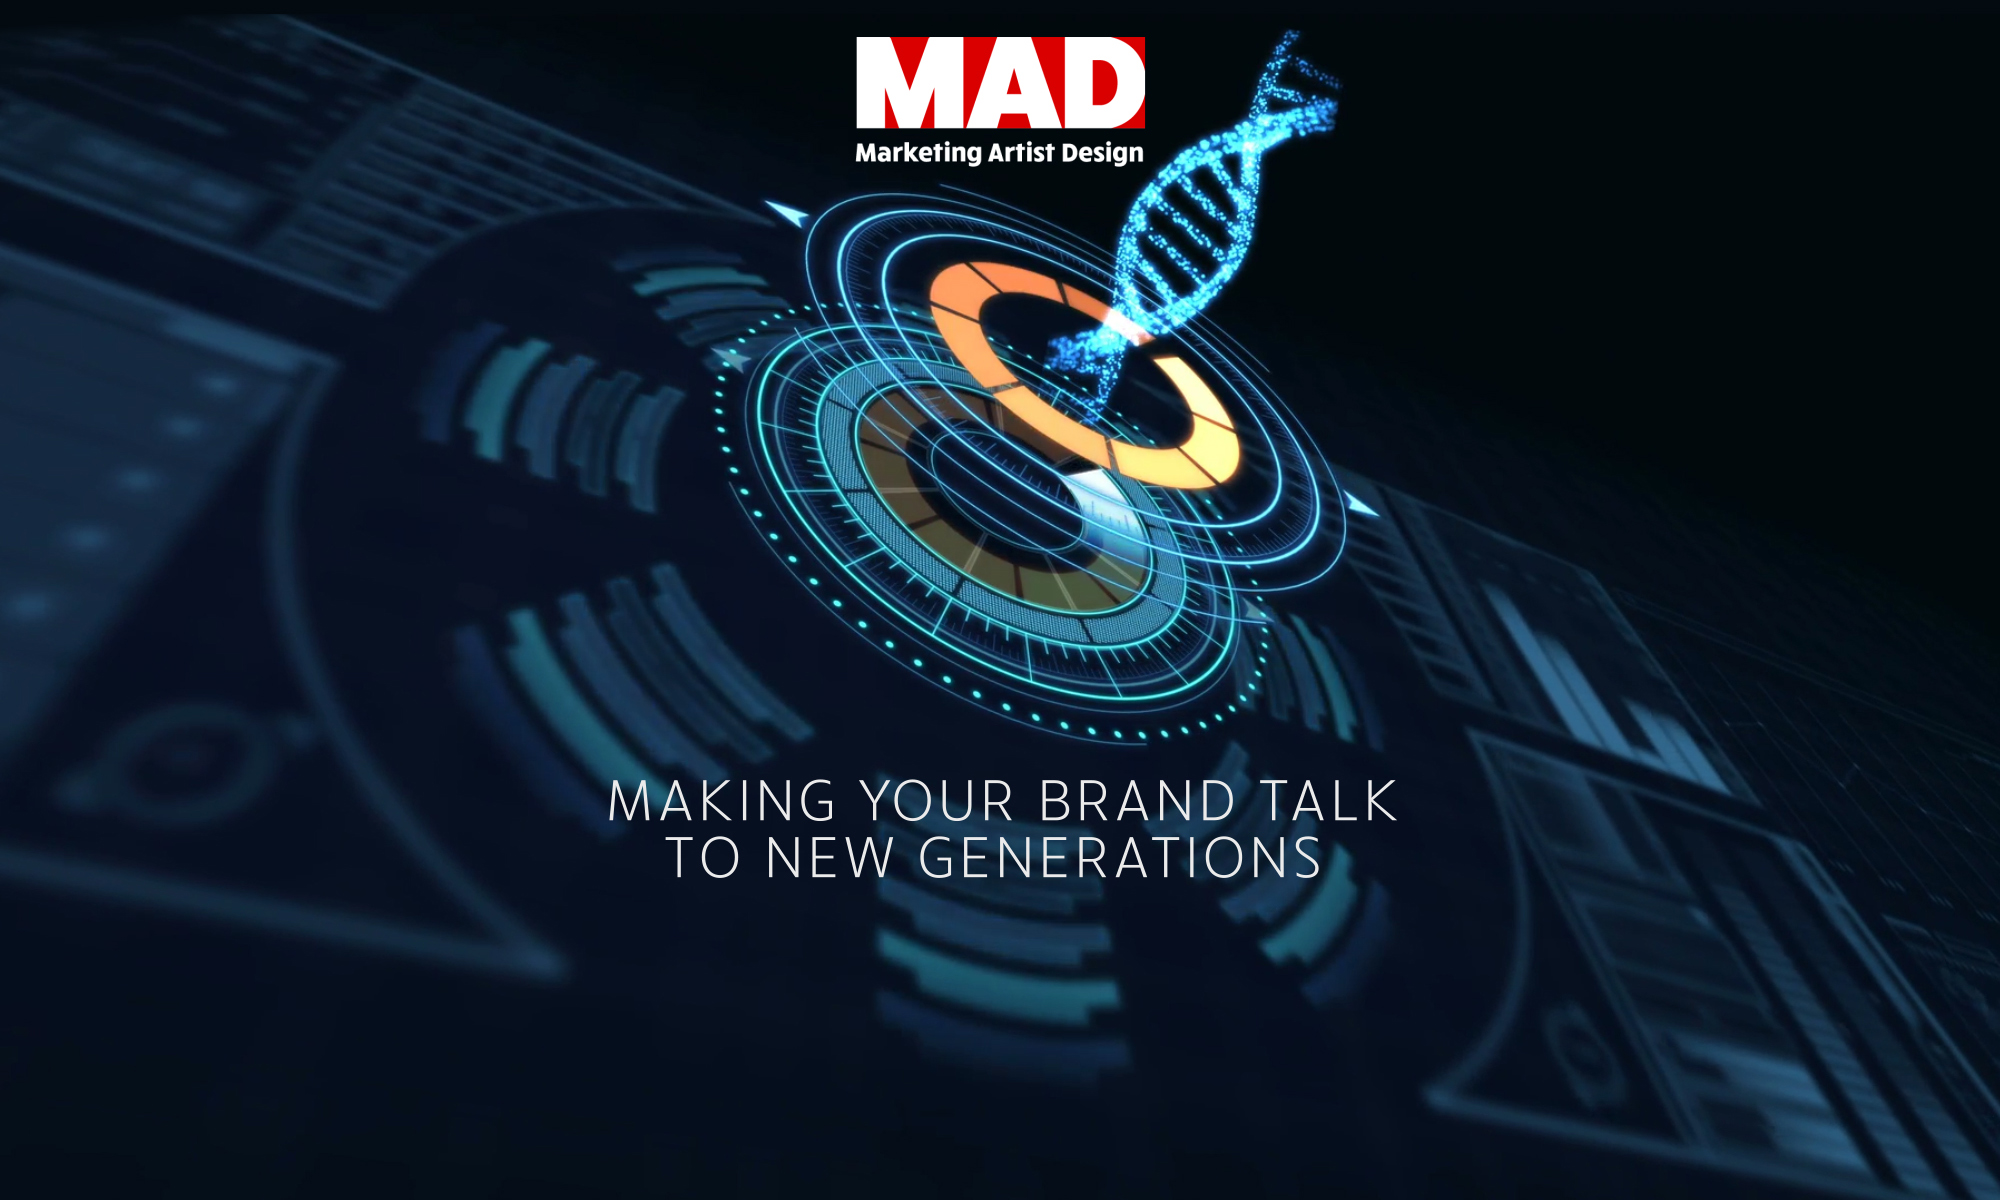 [MAD] Marketing Artist Design